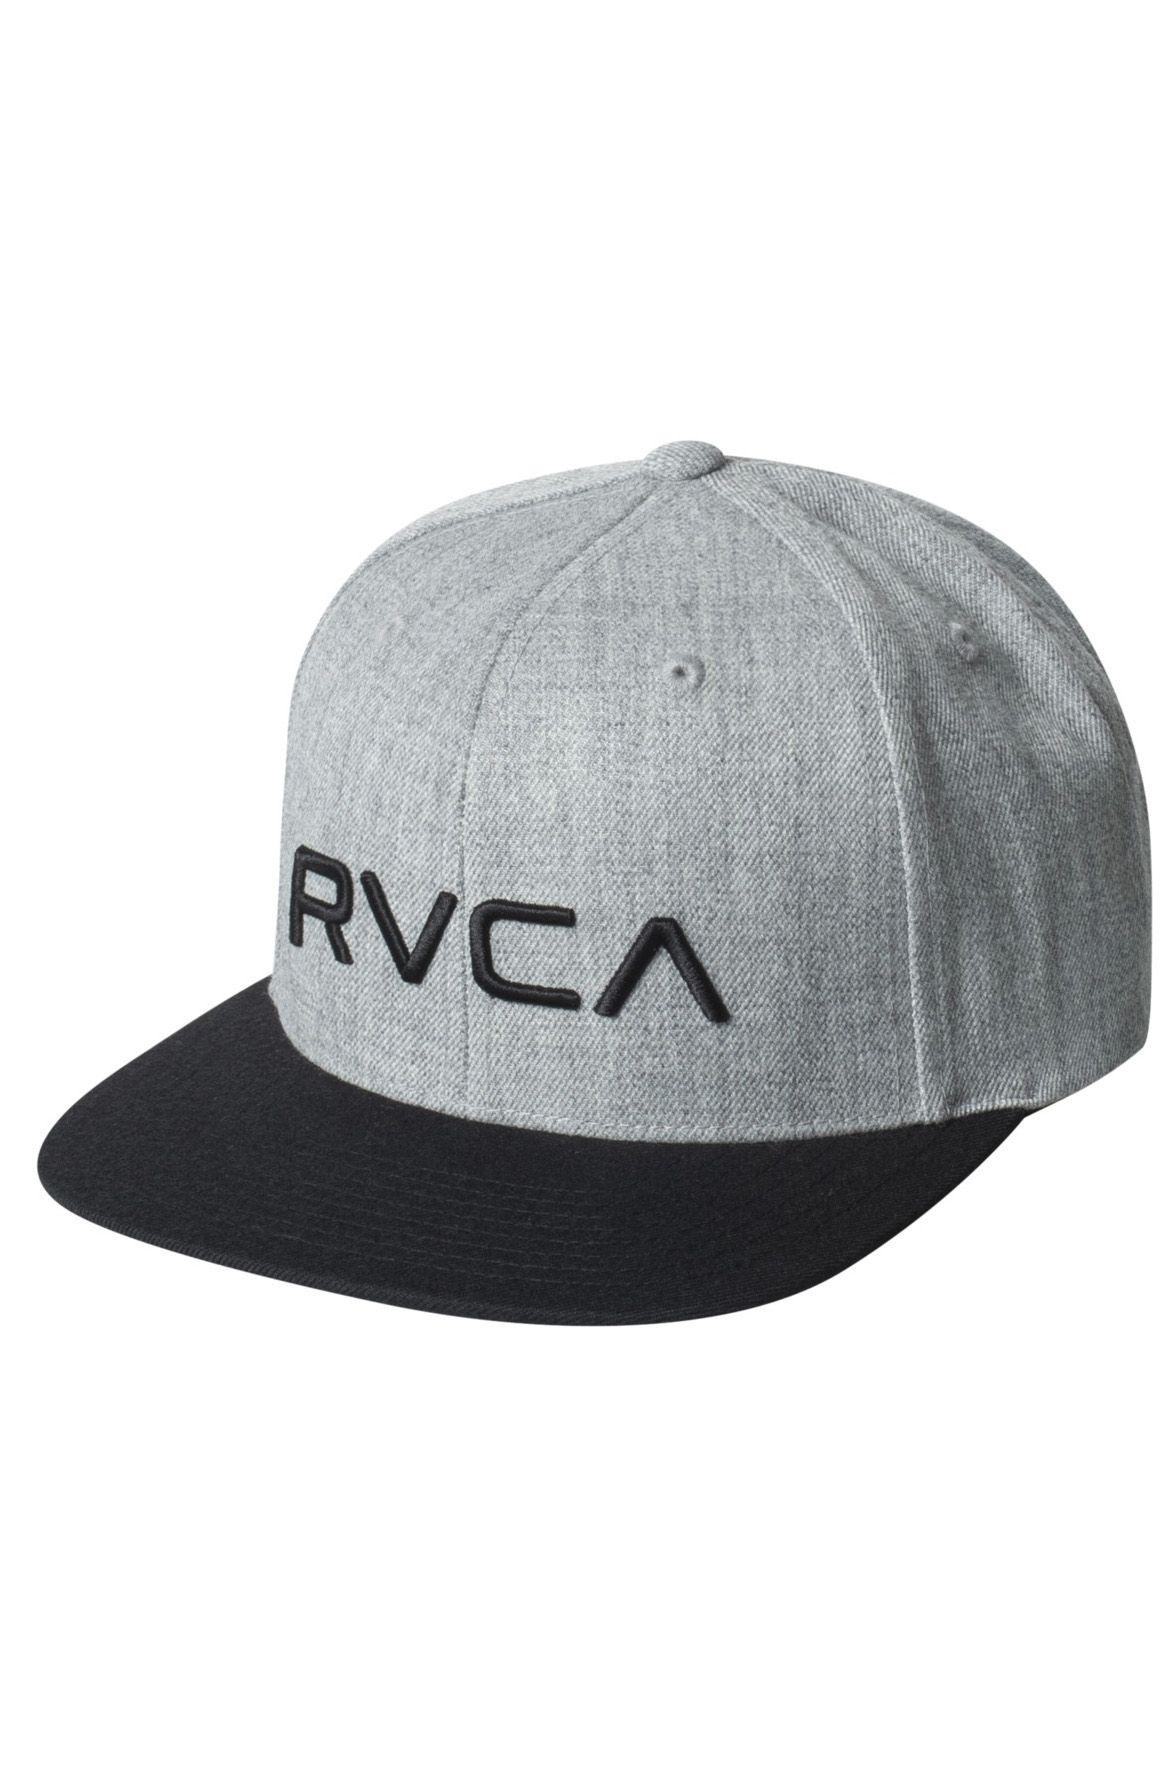 RVCA Cap   RVCA TWILL SNAPBACK Hthr Grey/Black